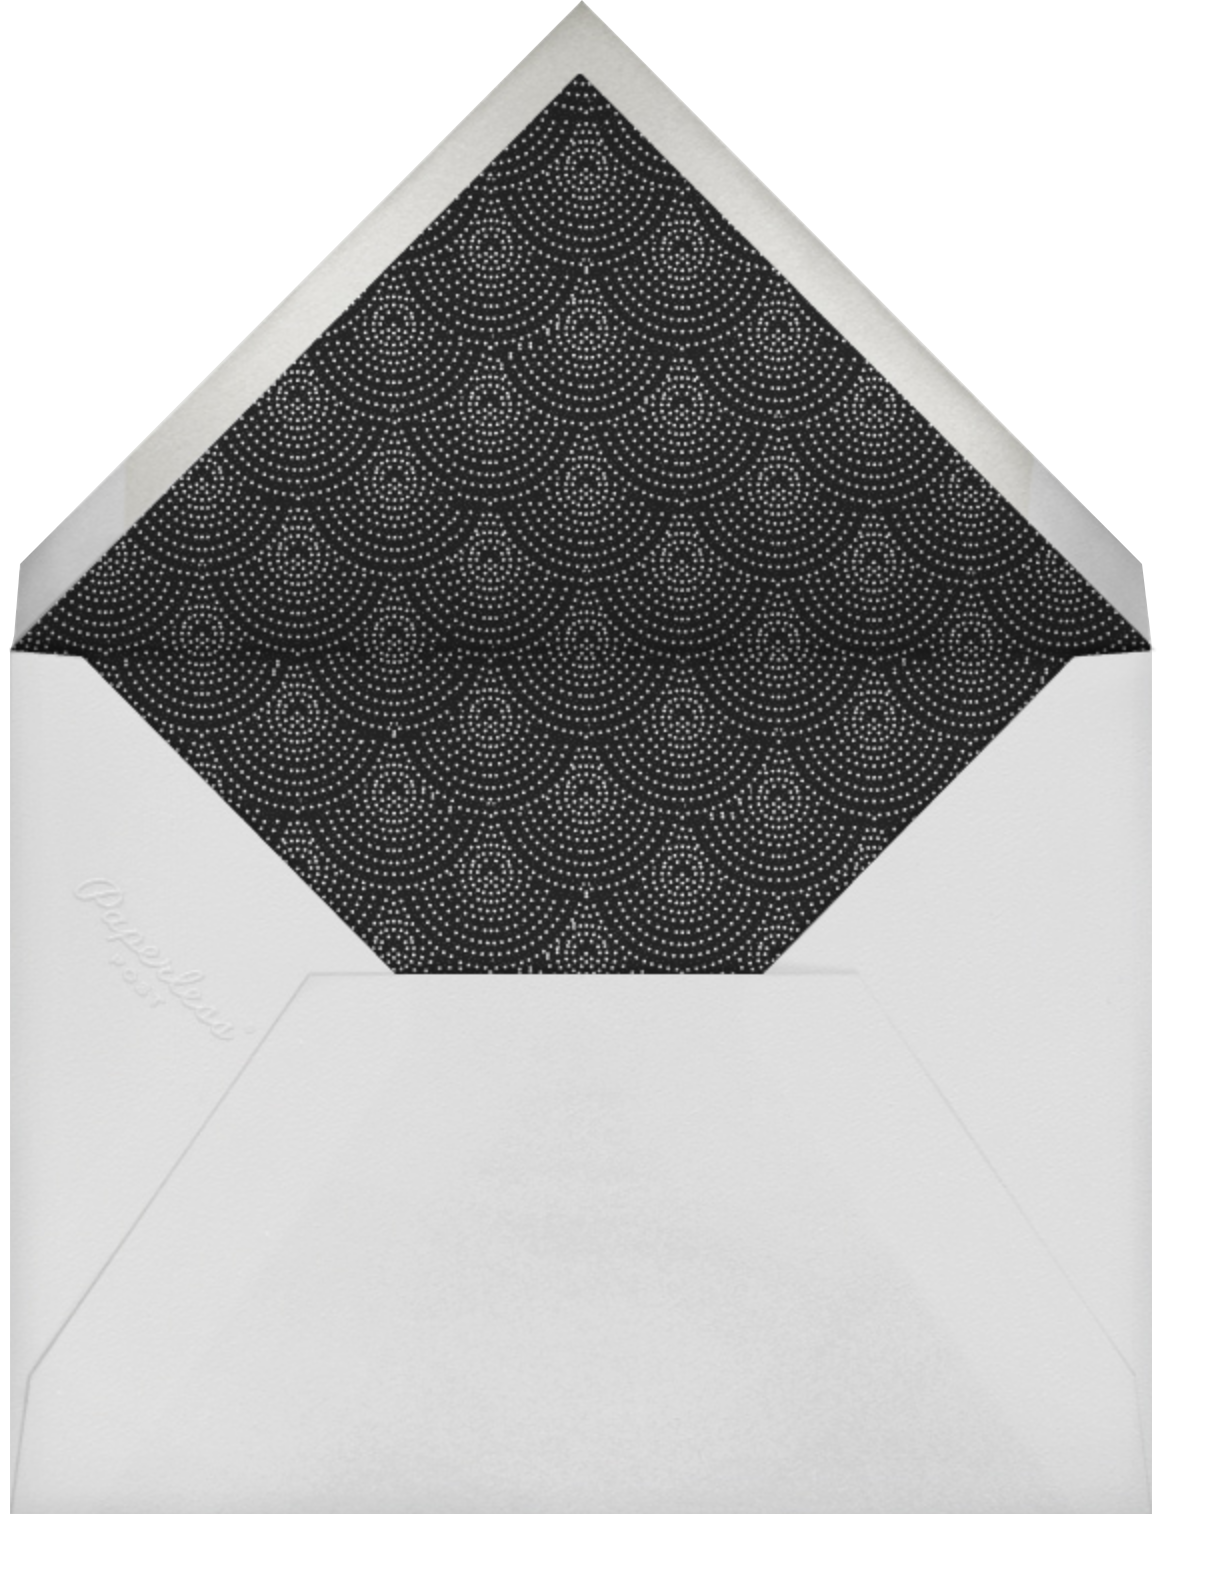 Croc Border - Walnut - Paperless Post - Adult birthday - envelope back